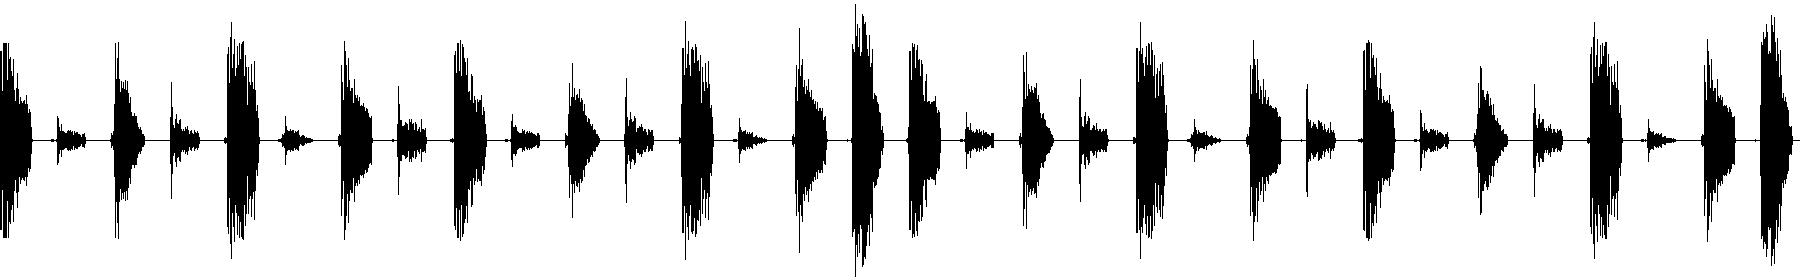 shg percussion loop 24